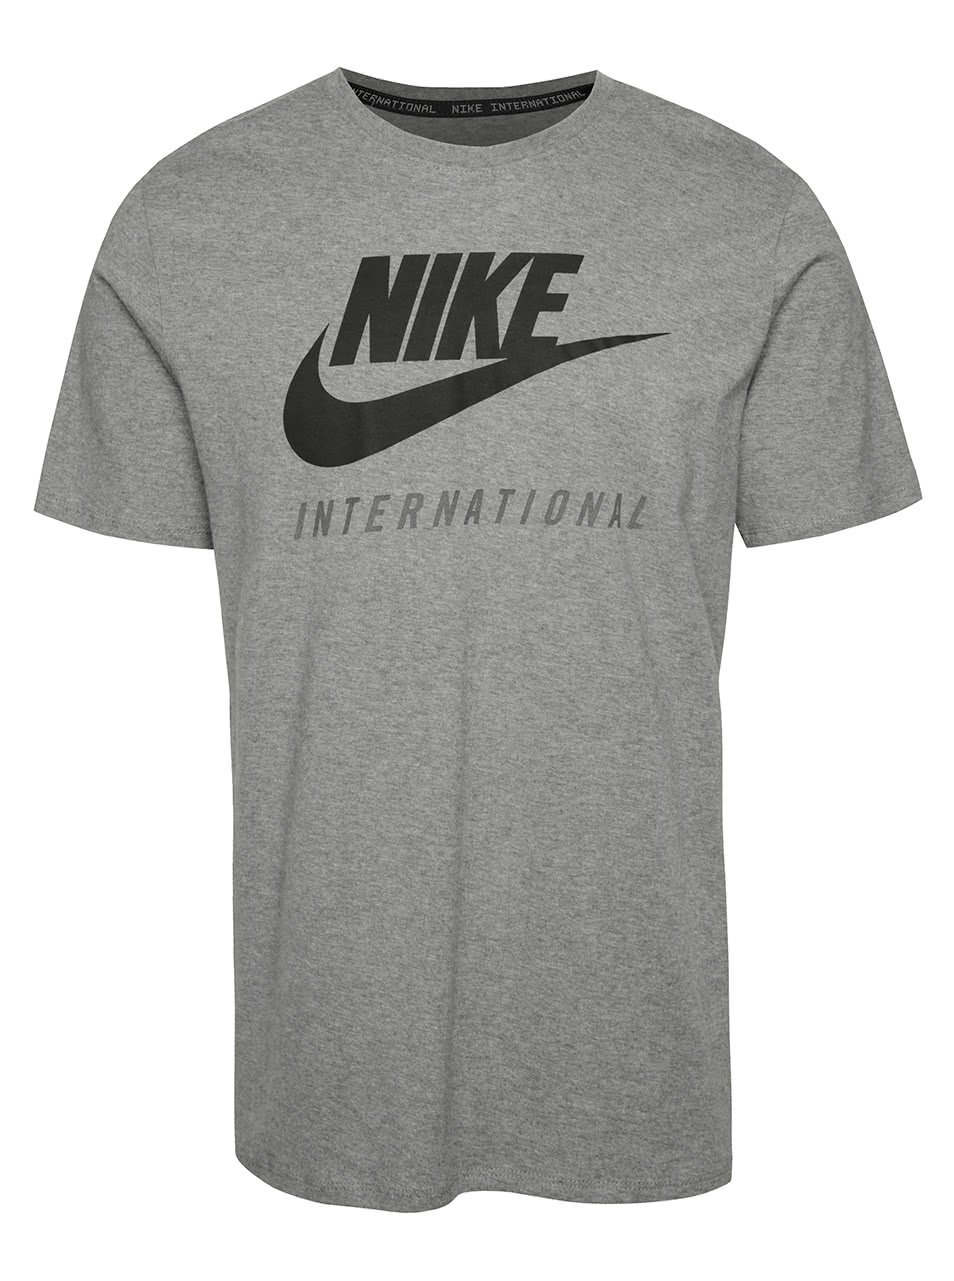 Šedé pánské triko s nápisem Nike International